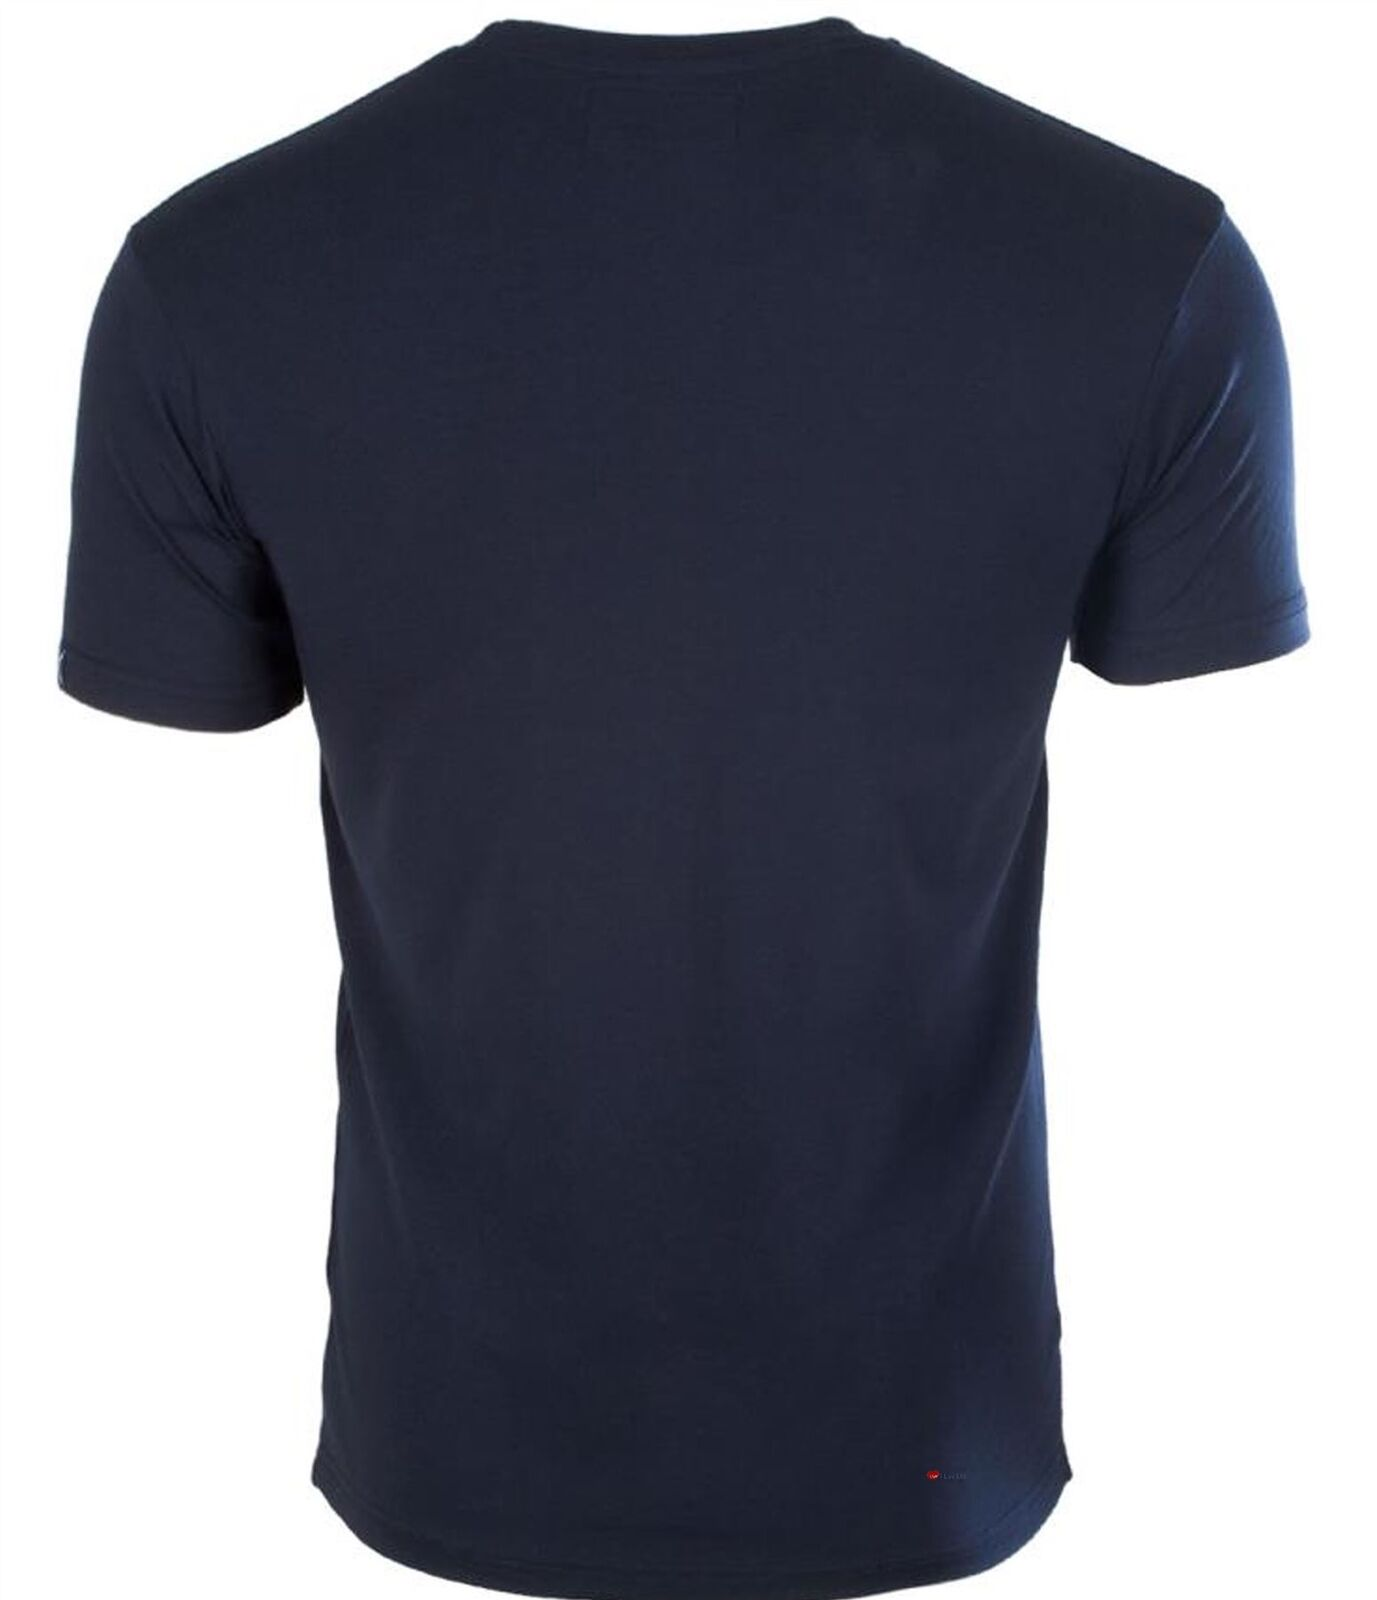 Gents Scotland Design Design Design T-Shirt With Lion Rampant Design In Navy Größe X-Large | Qualität  447043